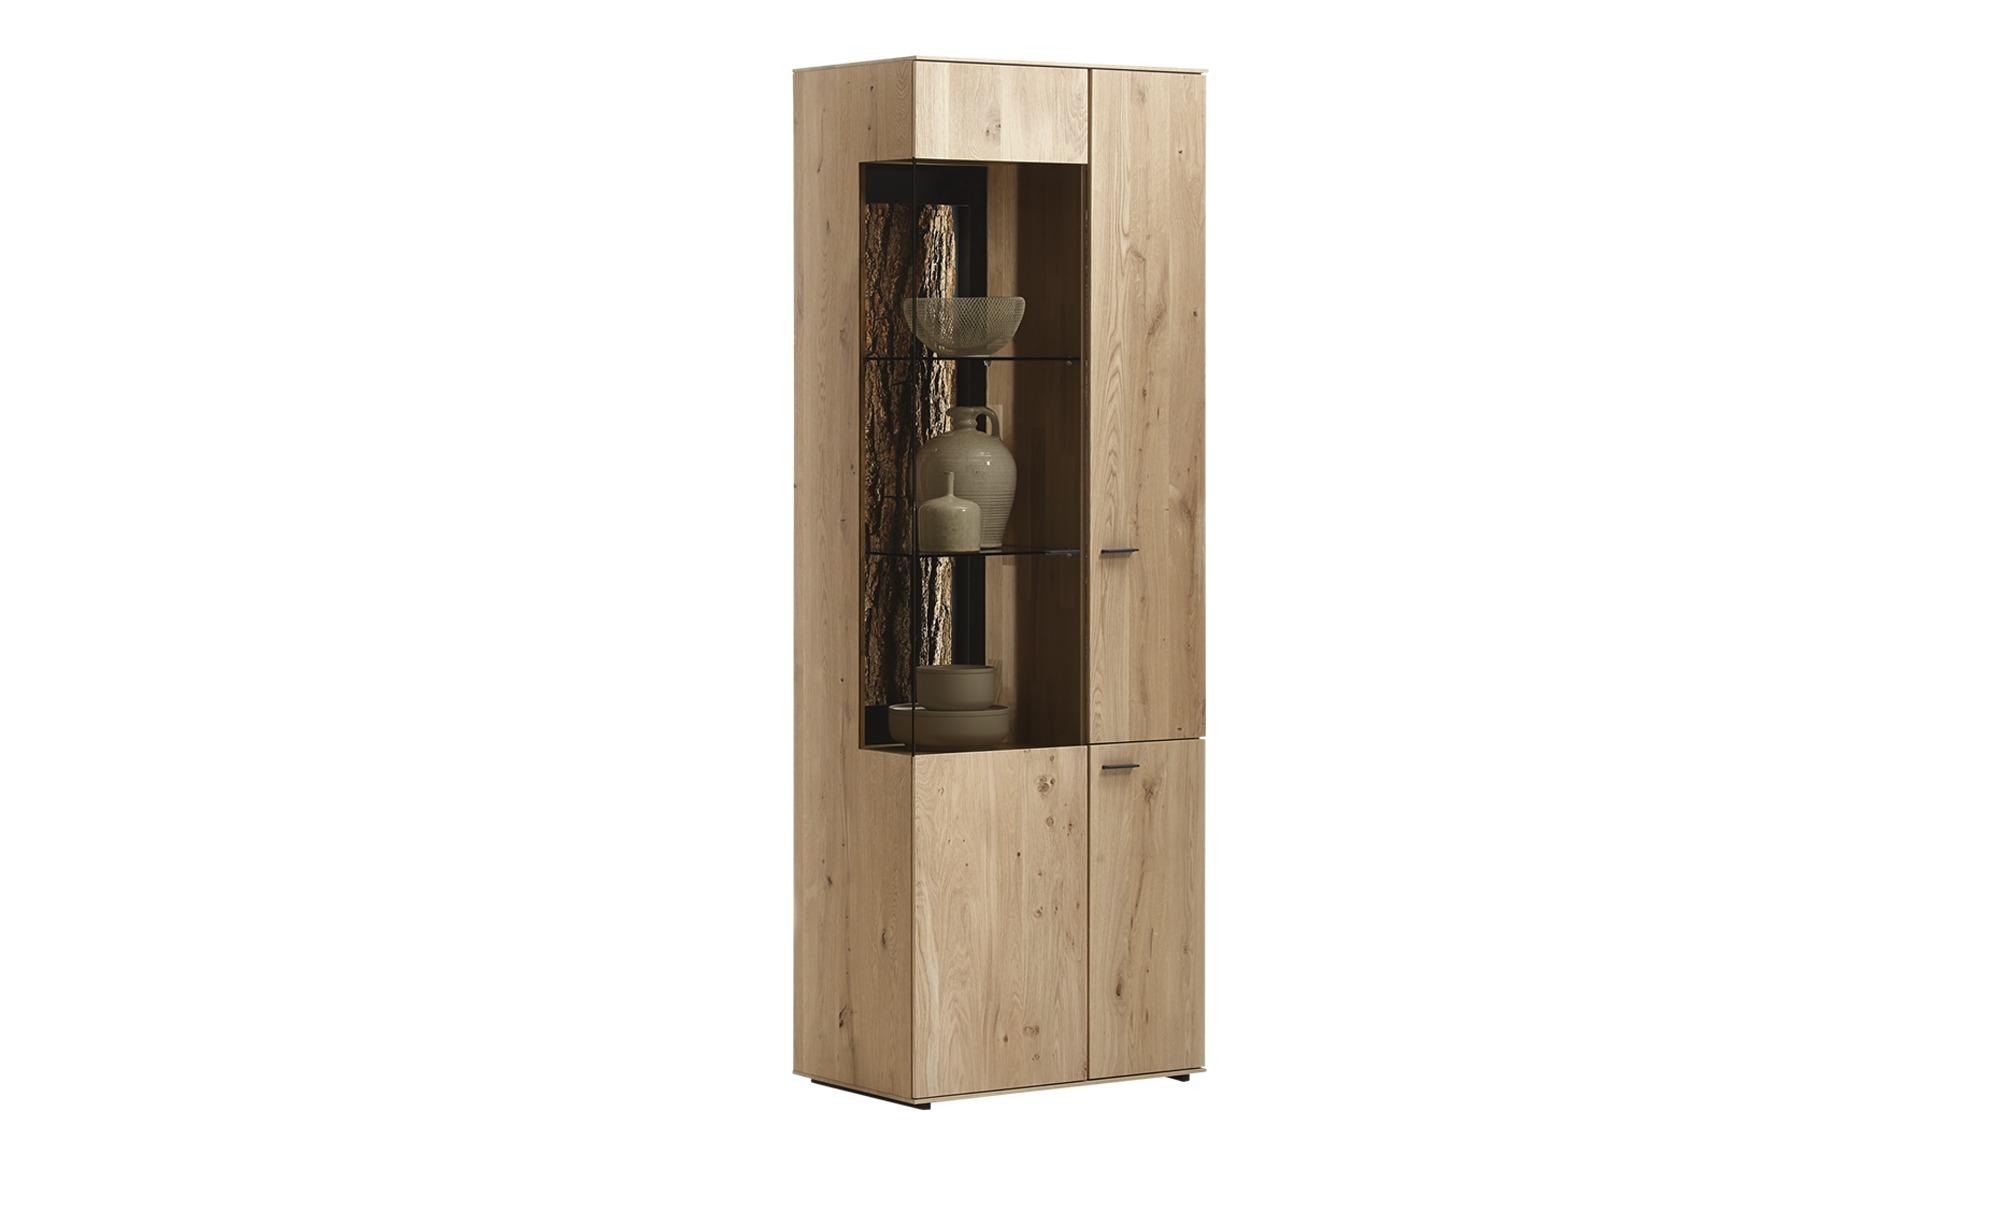 murano glas wandlampen 1960er 2er set physiotherapie in chemnitz. Black Bedroom Furniture Sets. Home Design Ideas